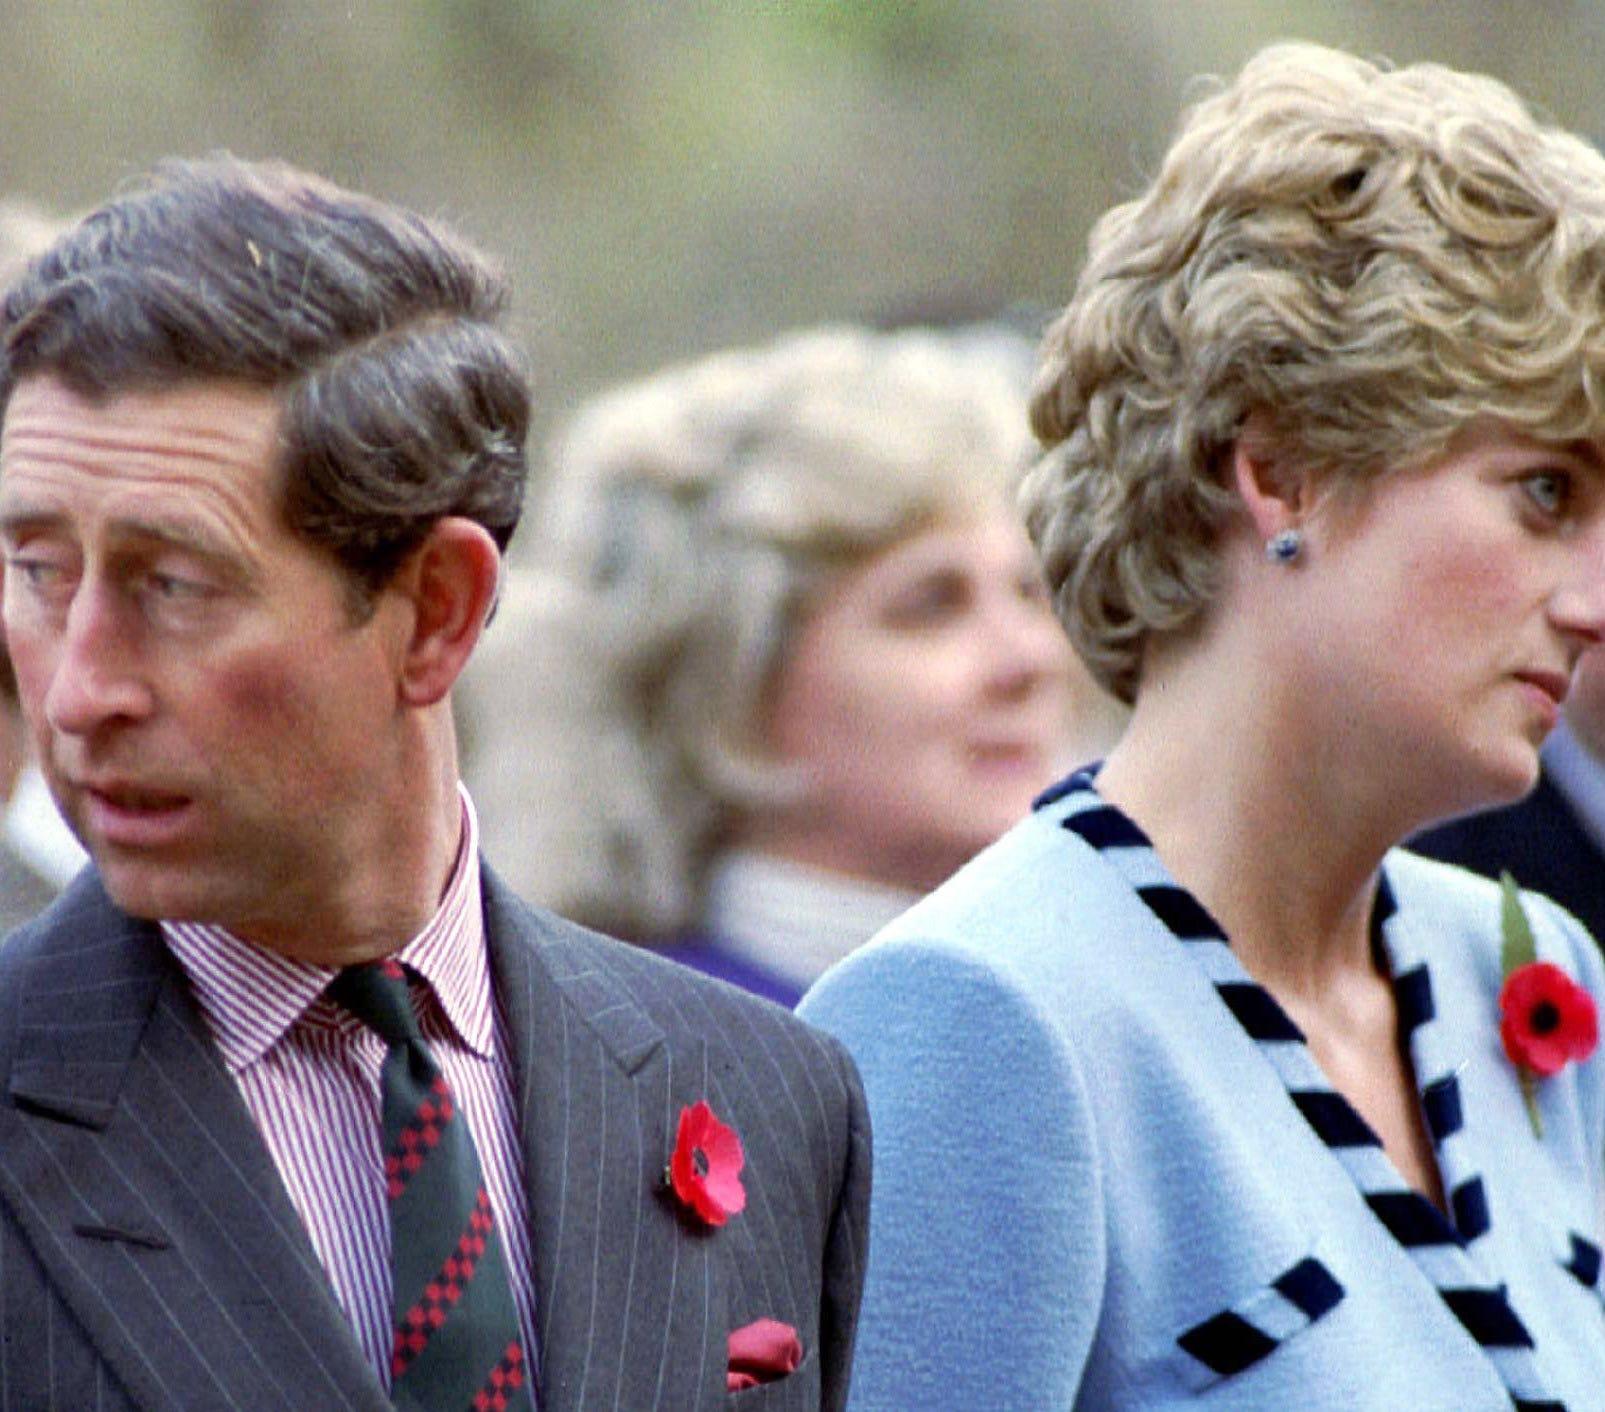 Did the Royal Family kill Princess Diana?!